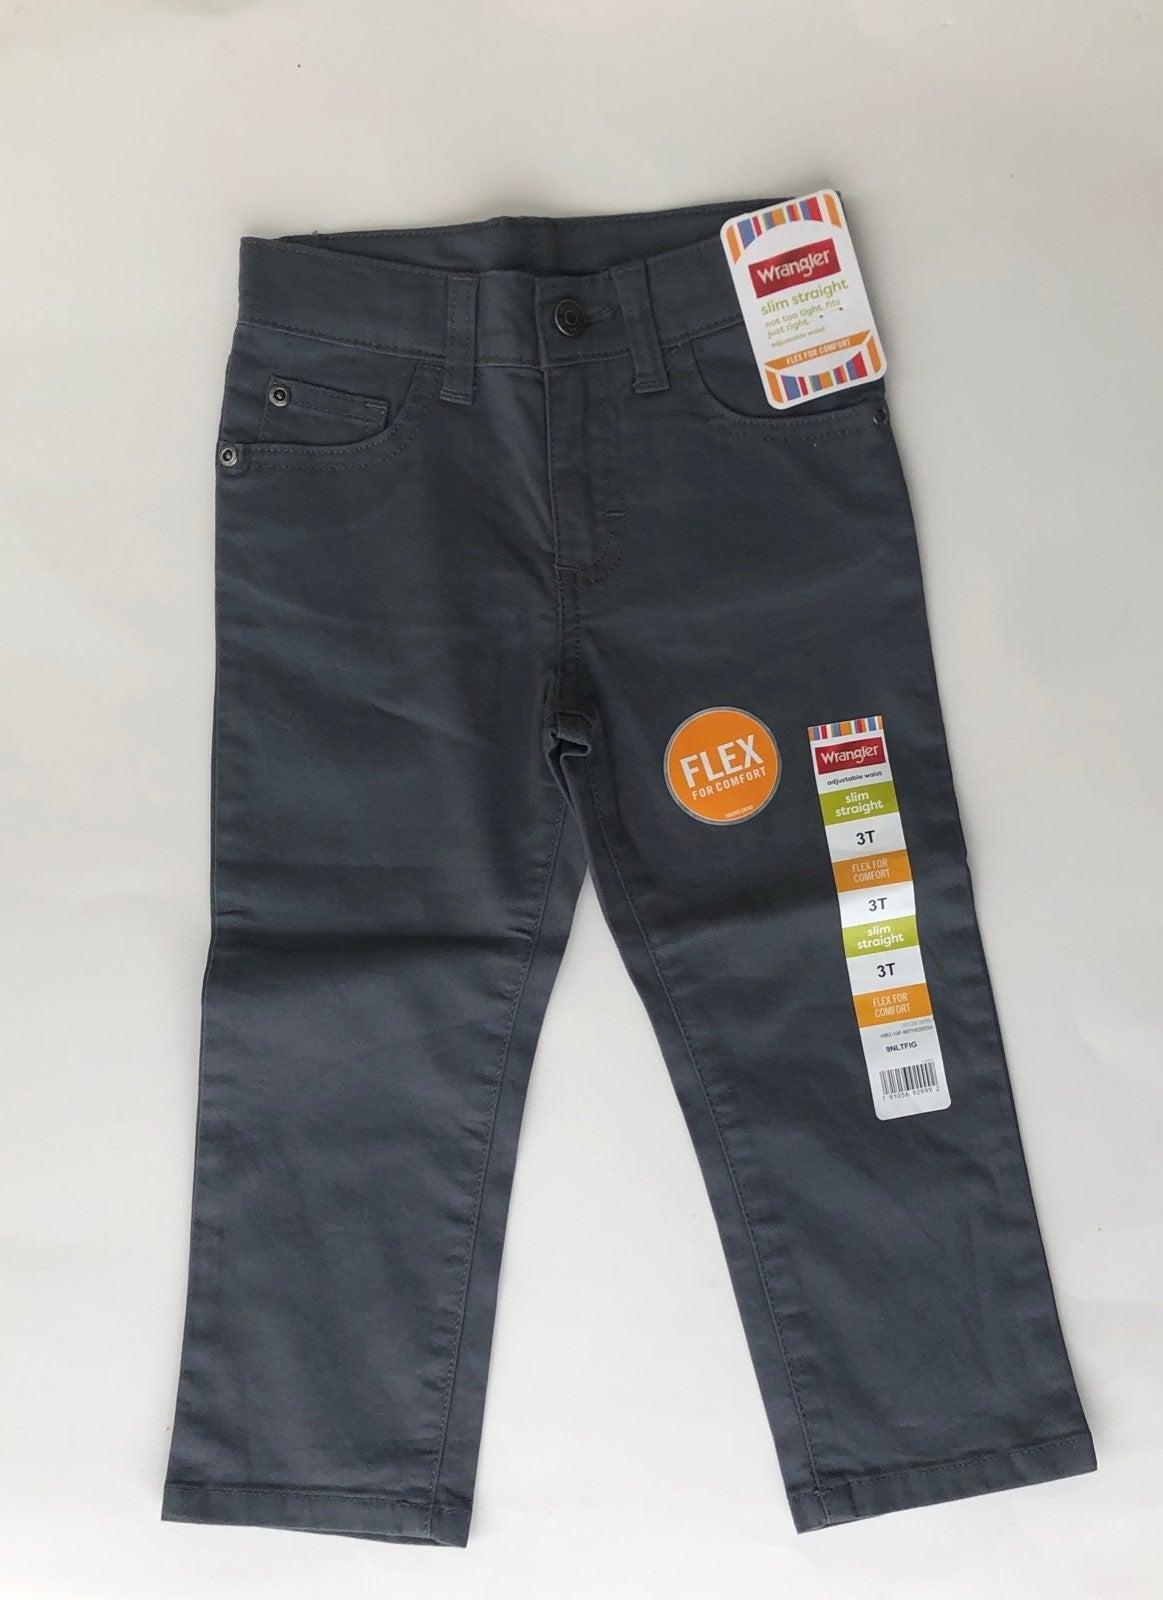 3T Wrangler Gray Pants Slim Straight NWT